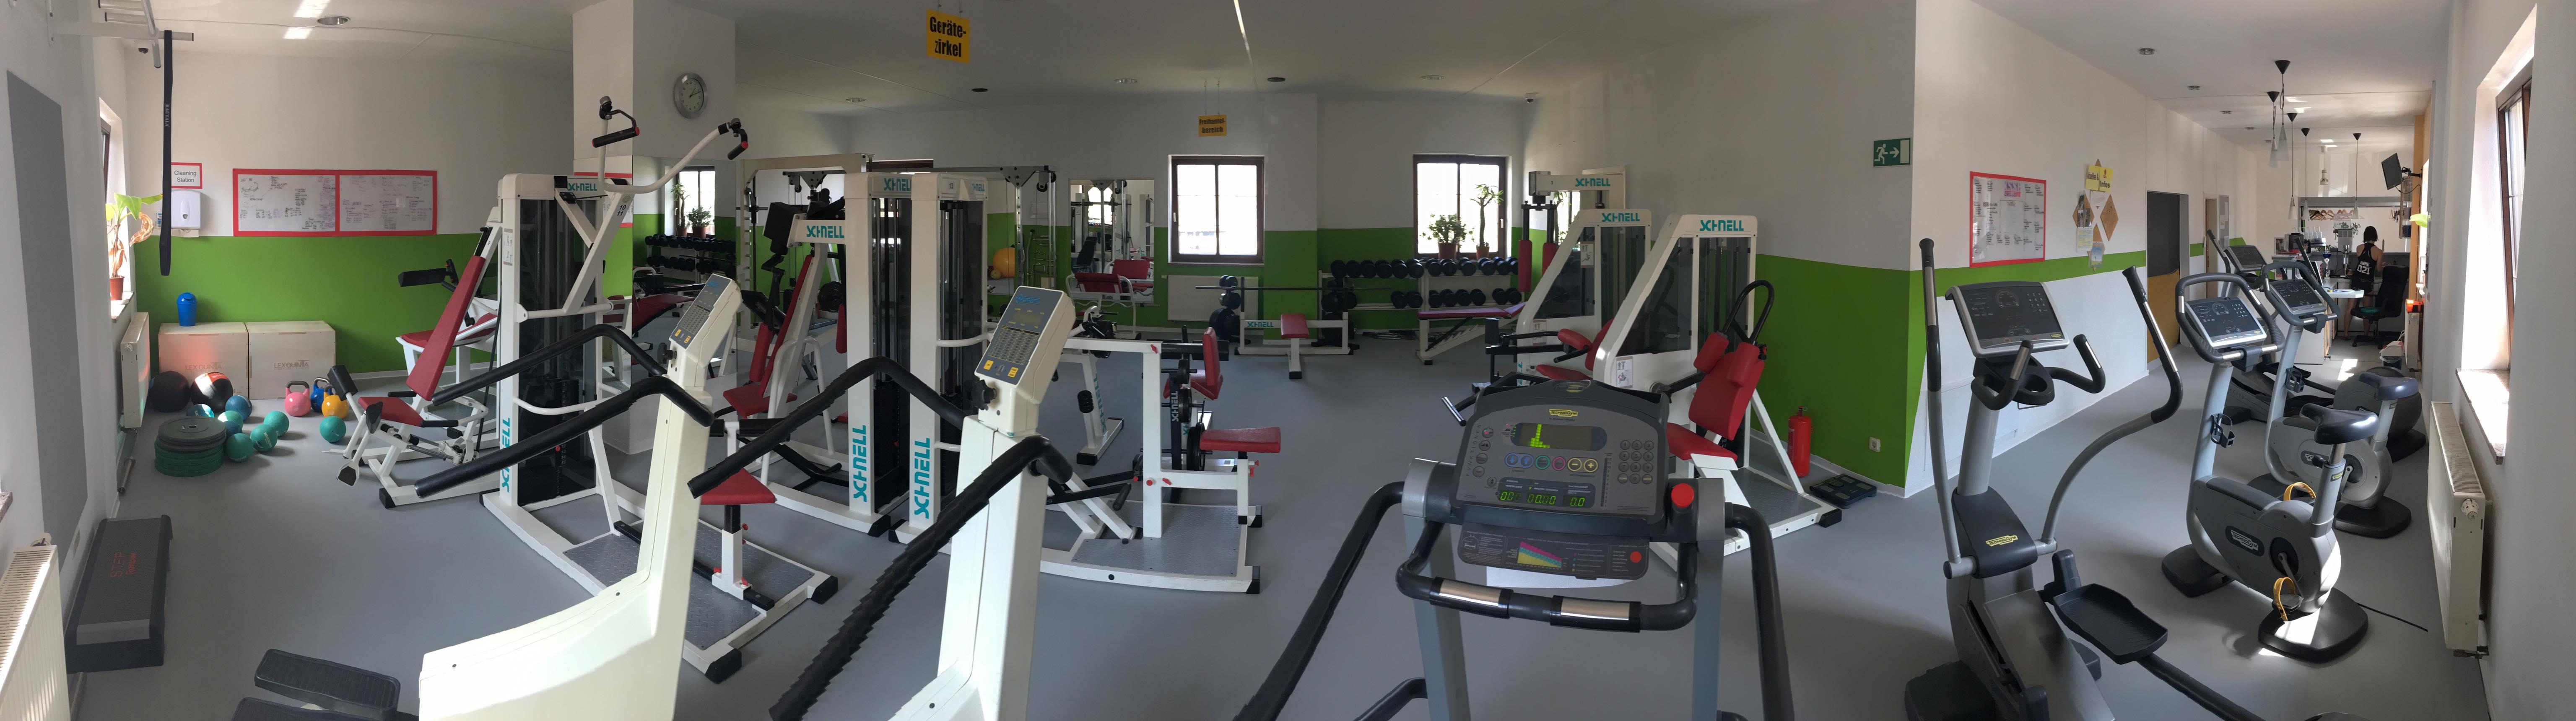 sport und fitnesstudio berk in vacha. Black Bedroom Furniture Sets. Home Design Ideas